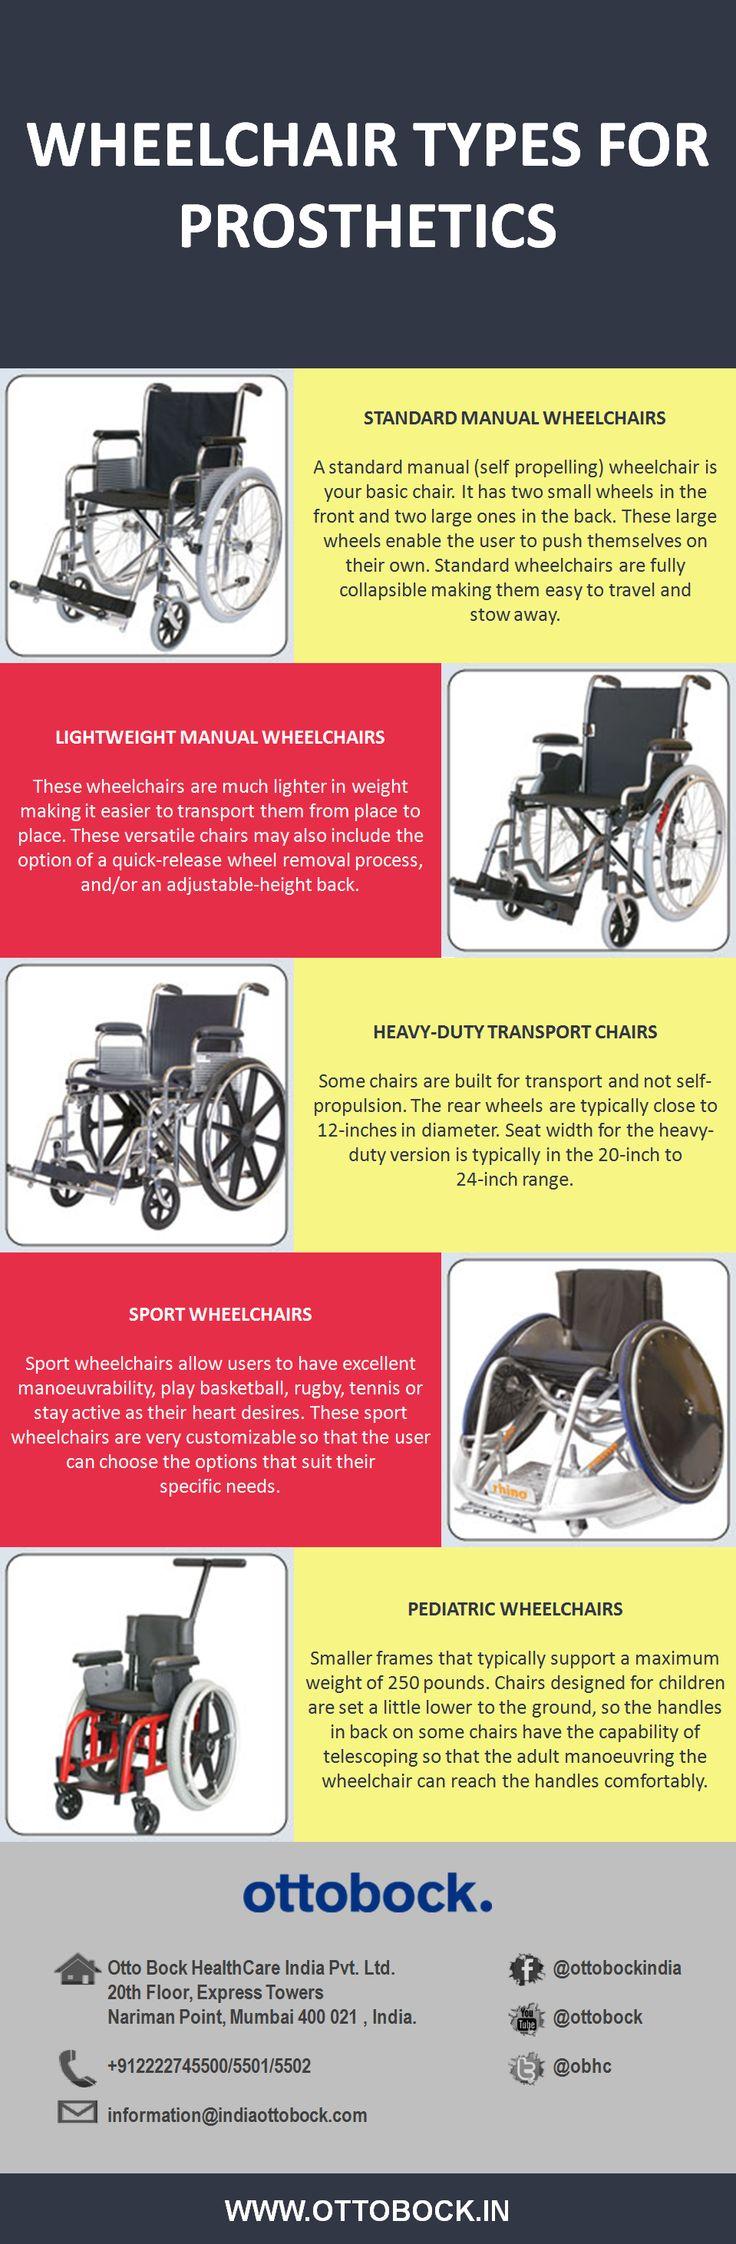 Lightweight, Sports, Pediatric wheelchair types for leg prosthetics by Ottobock.